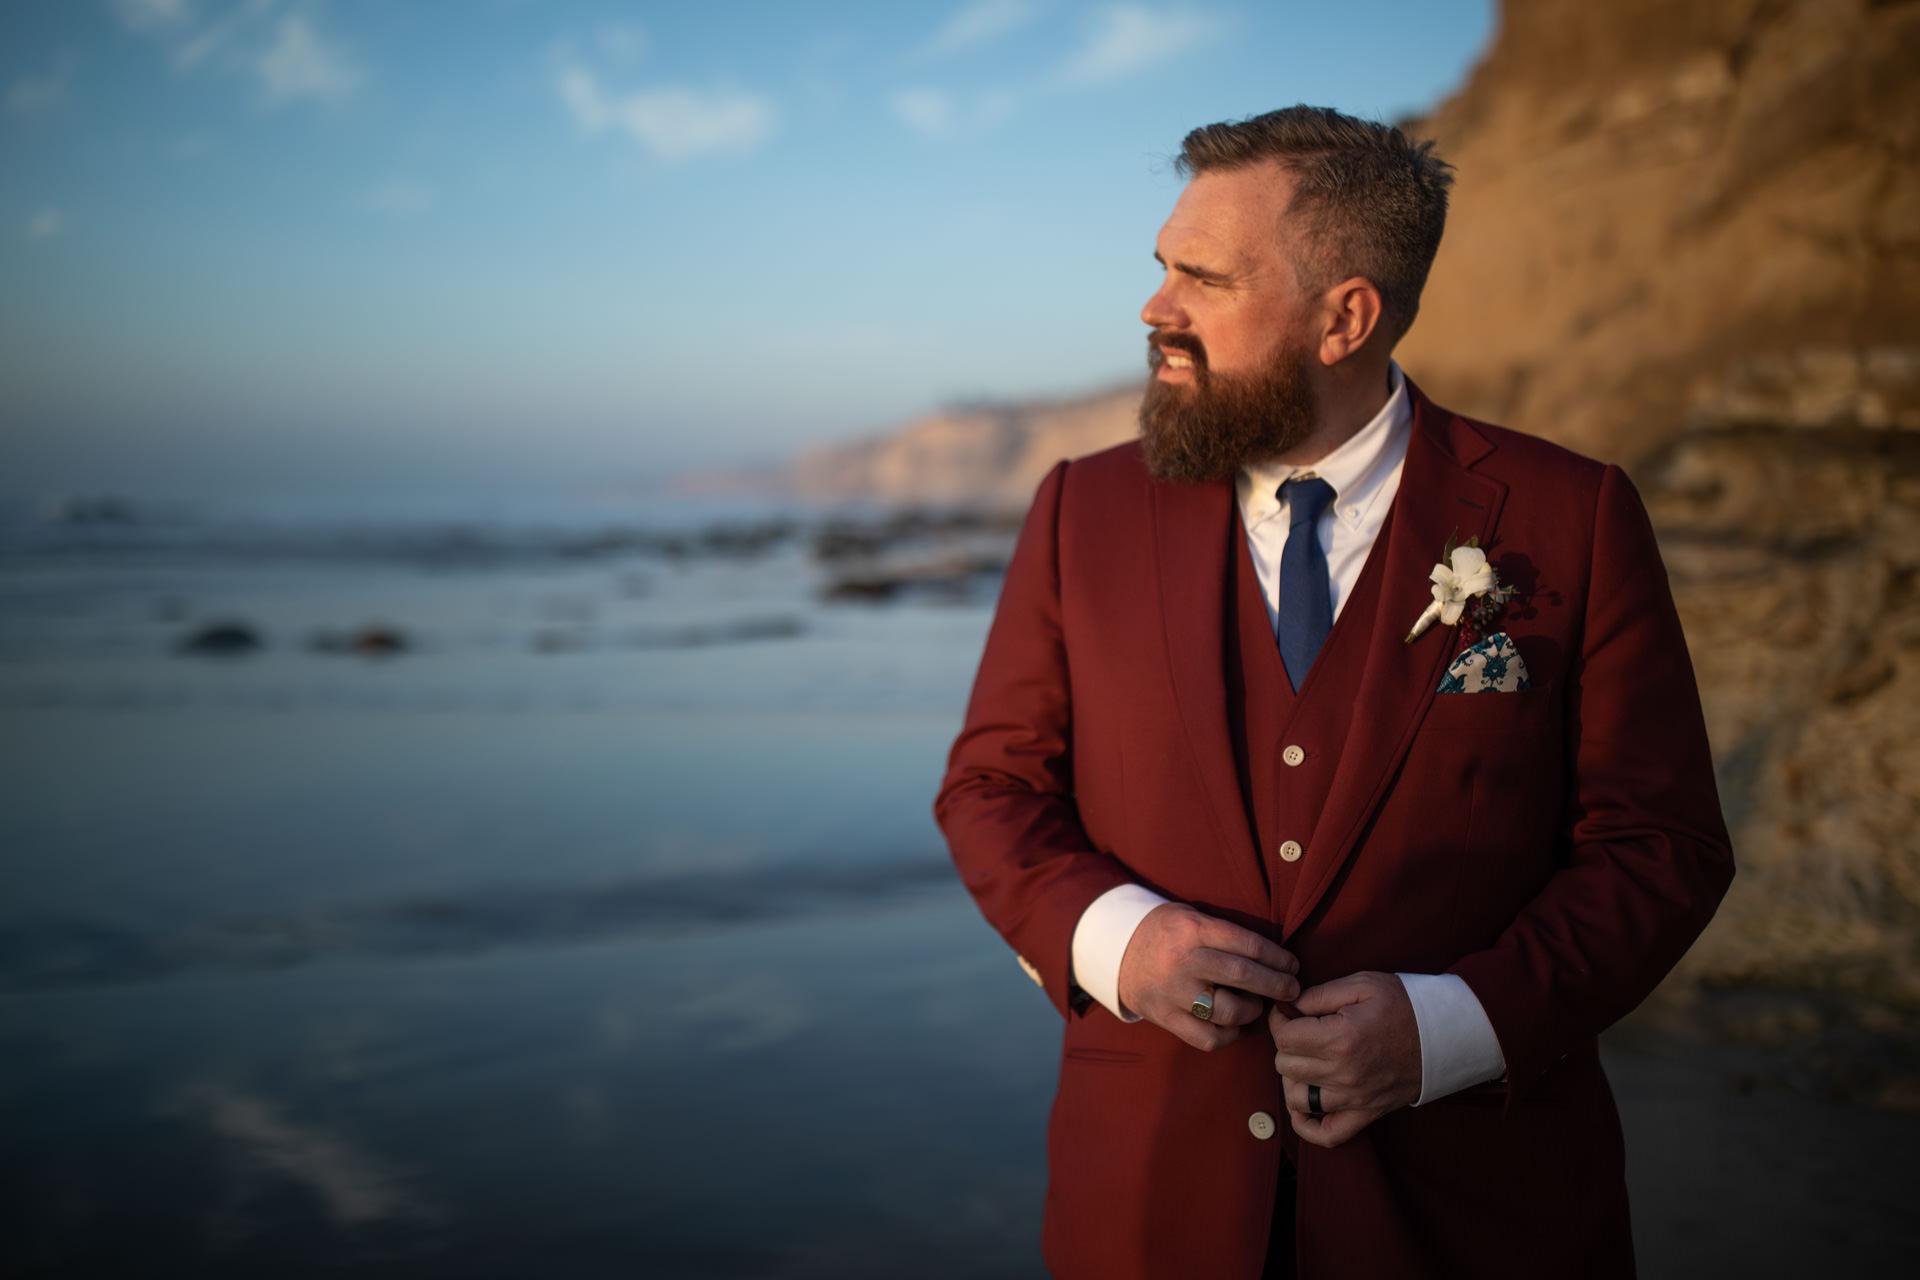 Eric La Jolla Groom Portrait San Diego Beach Wedding Sunset by Faces Photography